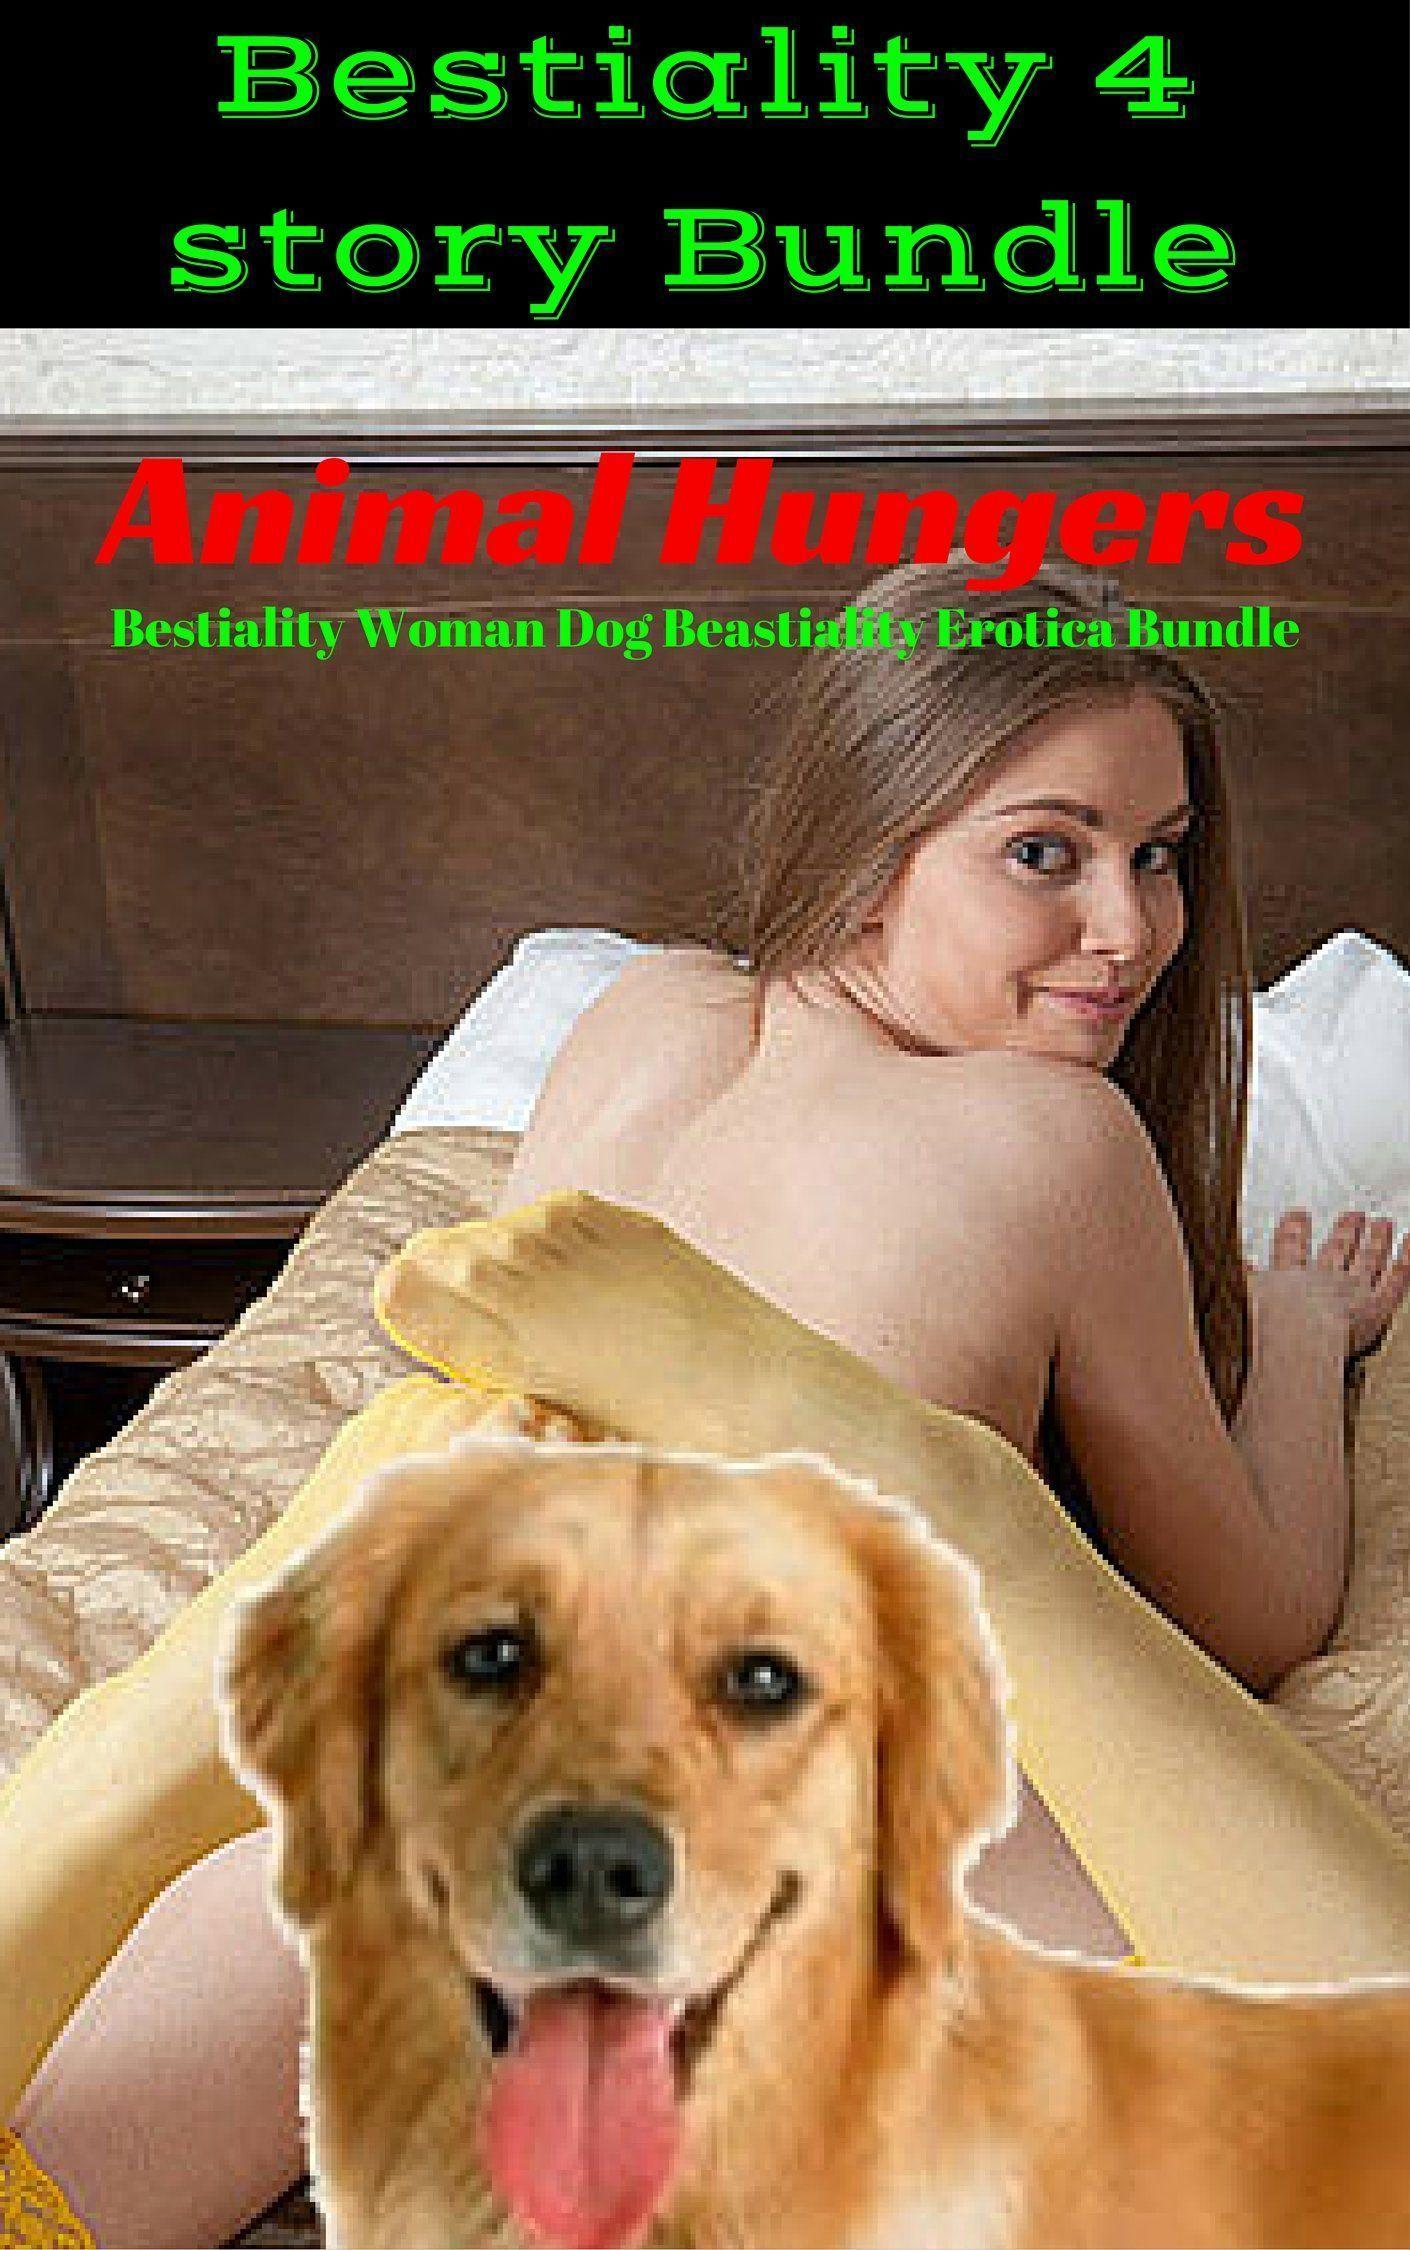 Animal Handjob Sex Porn dogs creampie women sex stories . porn pictures. comments: 3